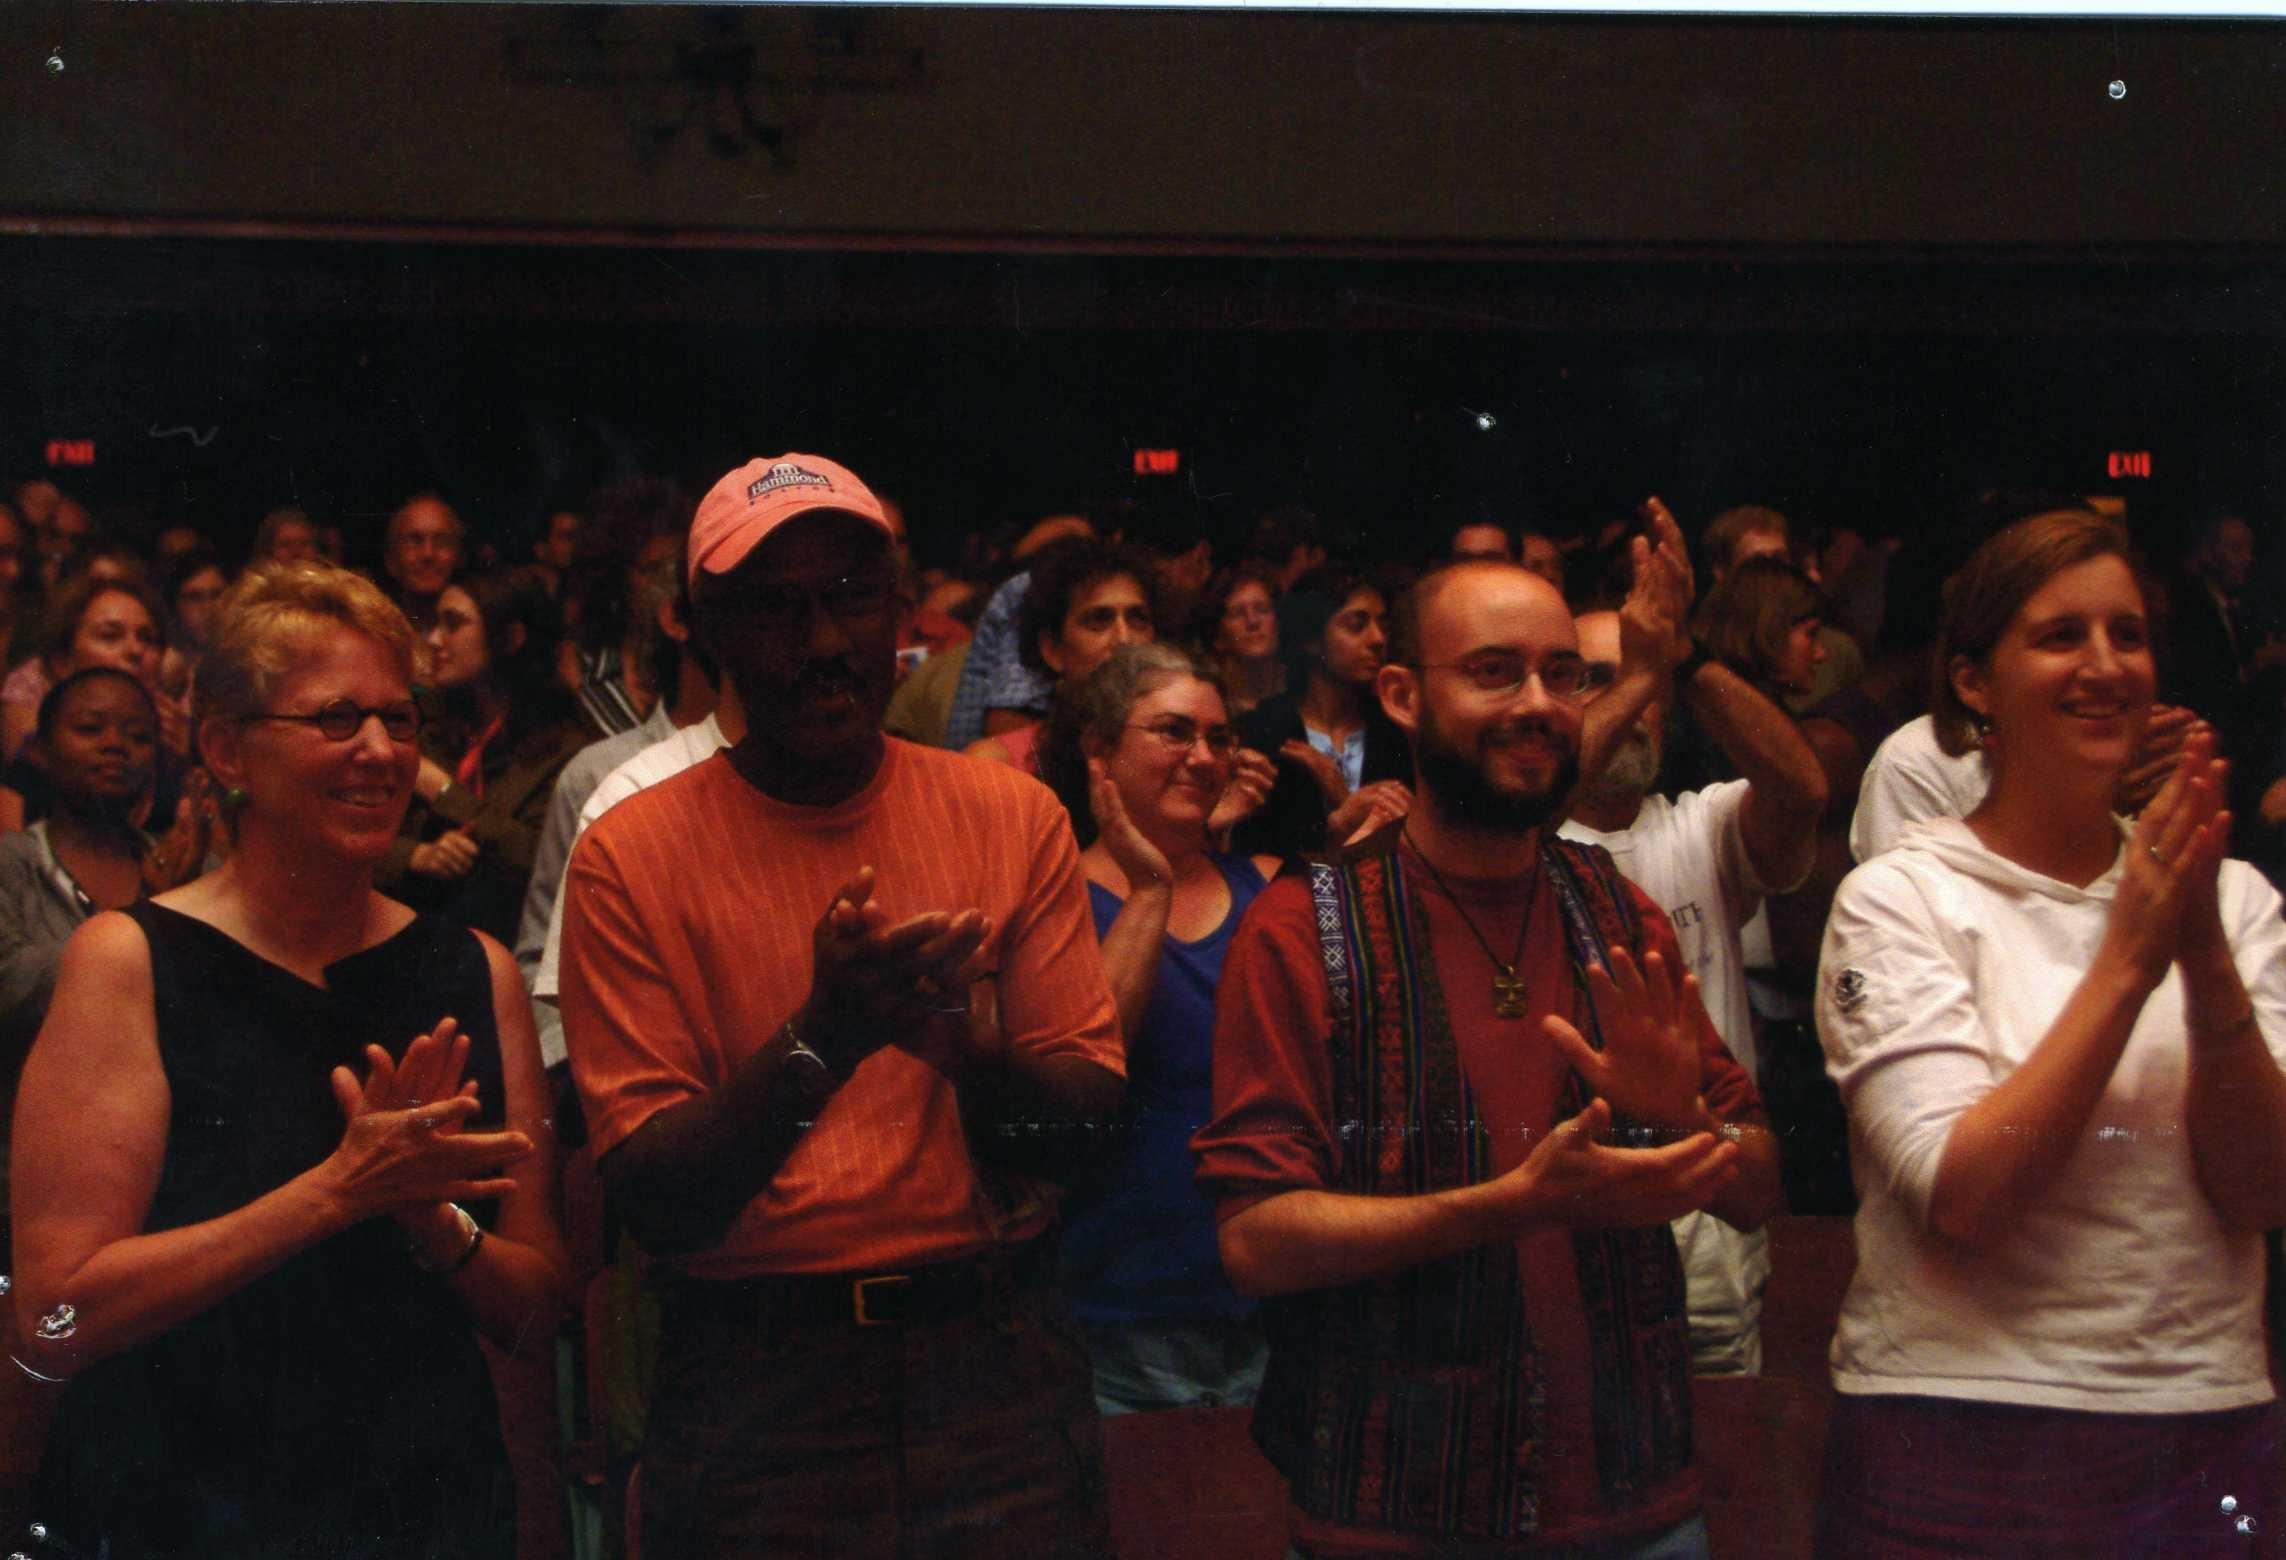 img2003 Standing ovation.JPG